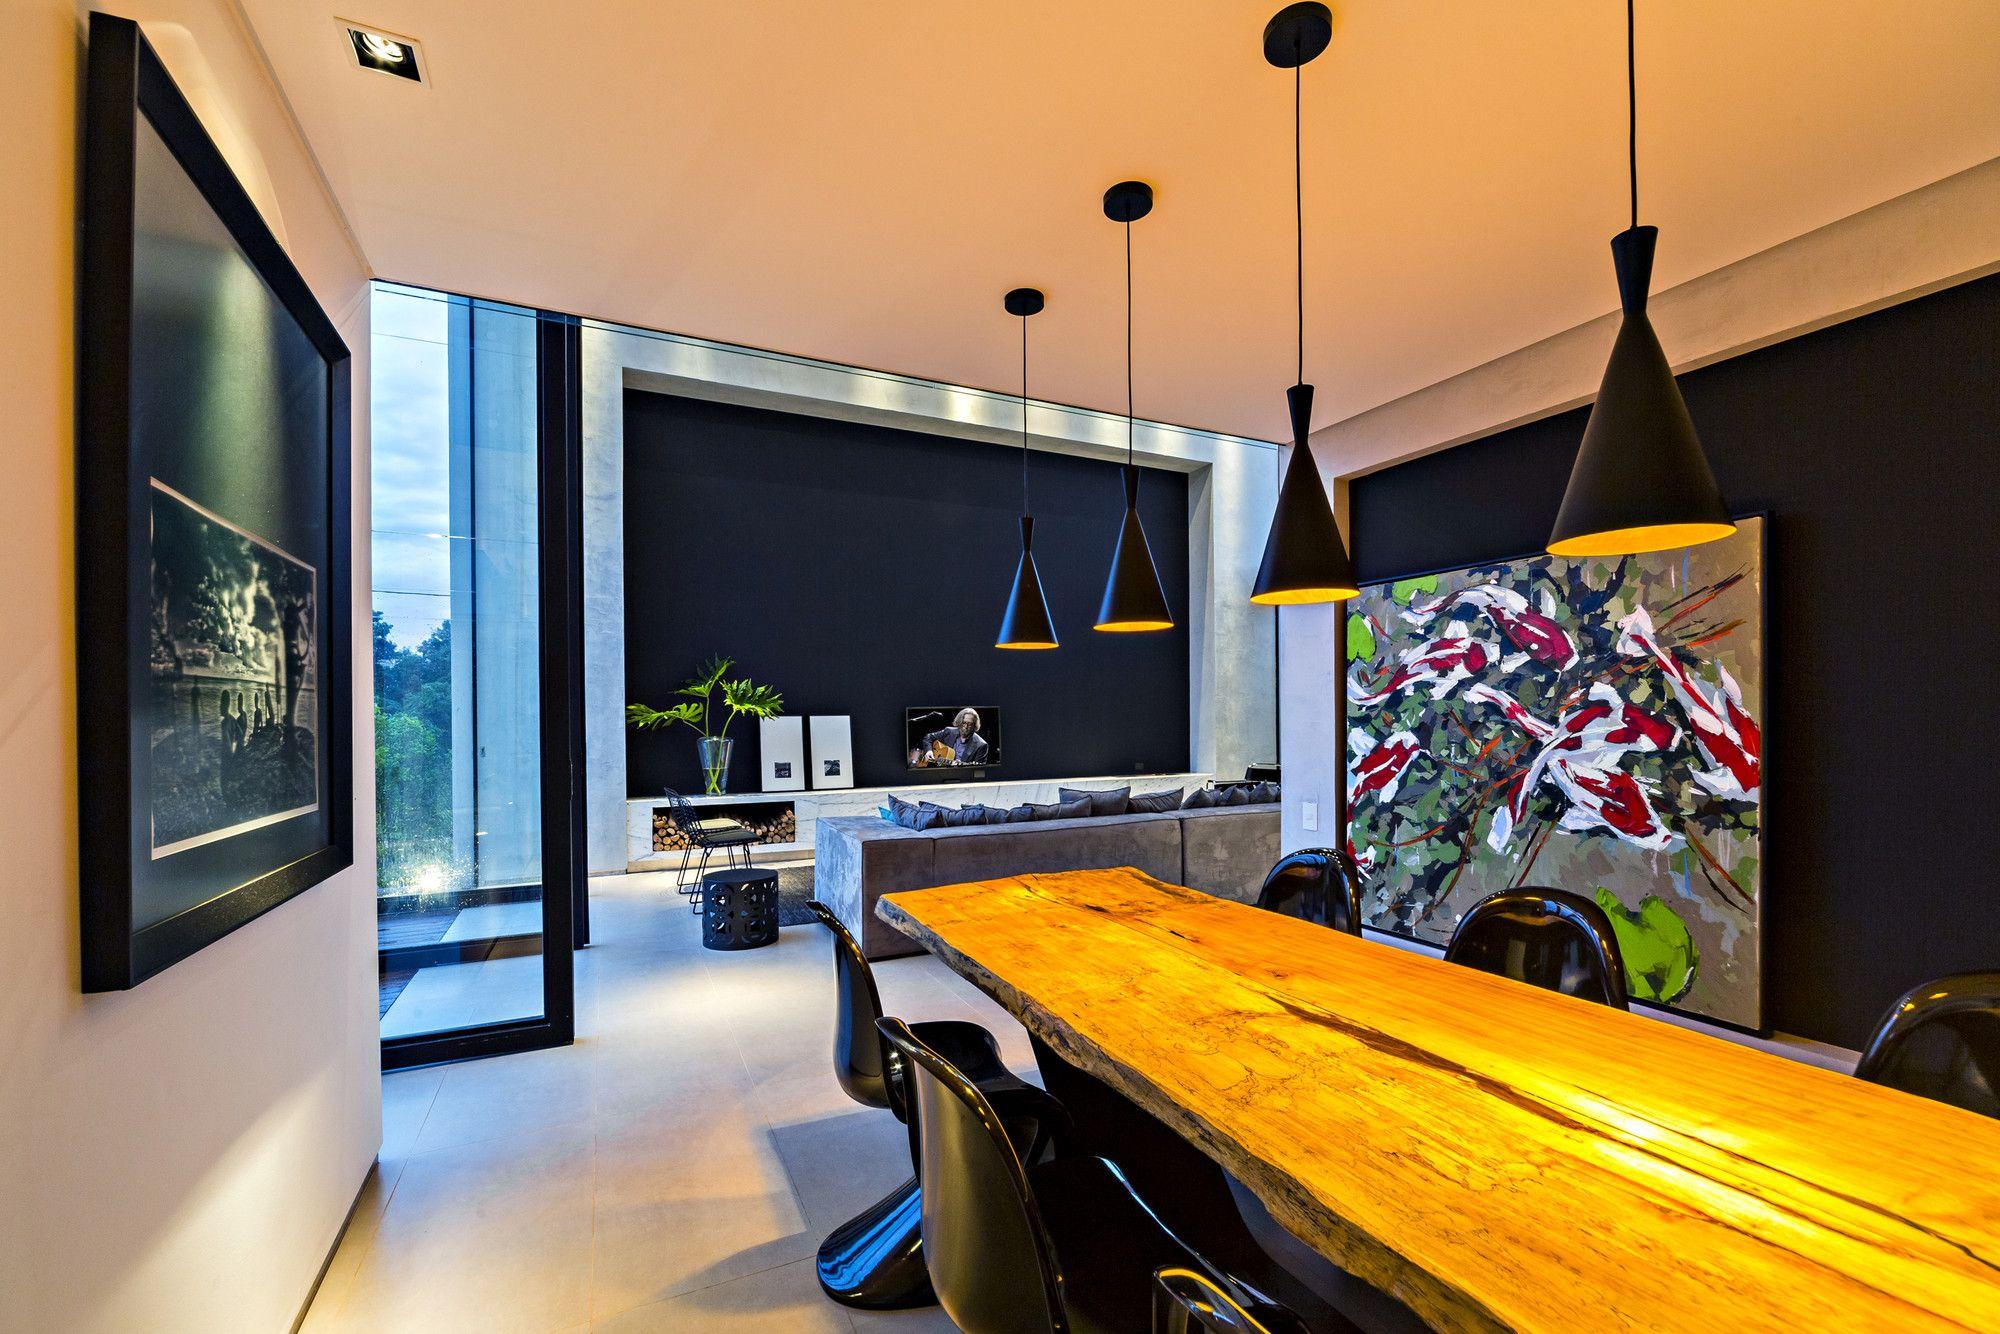 interiores | SPAGNUOLO ARQUITETURA